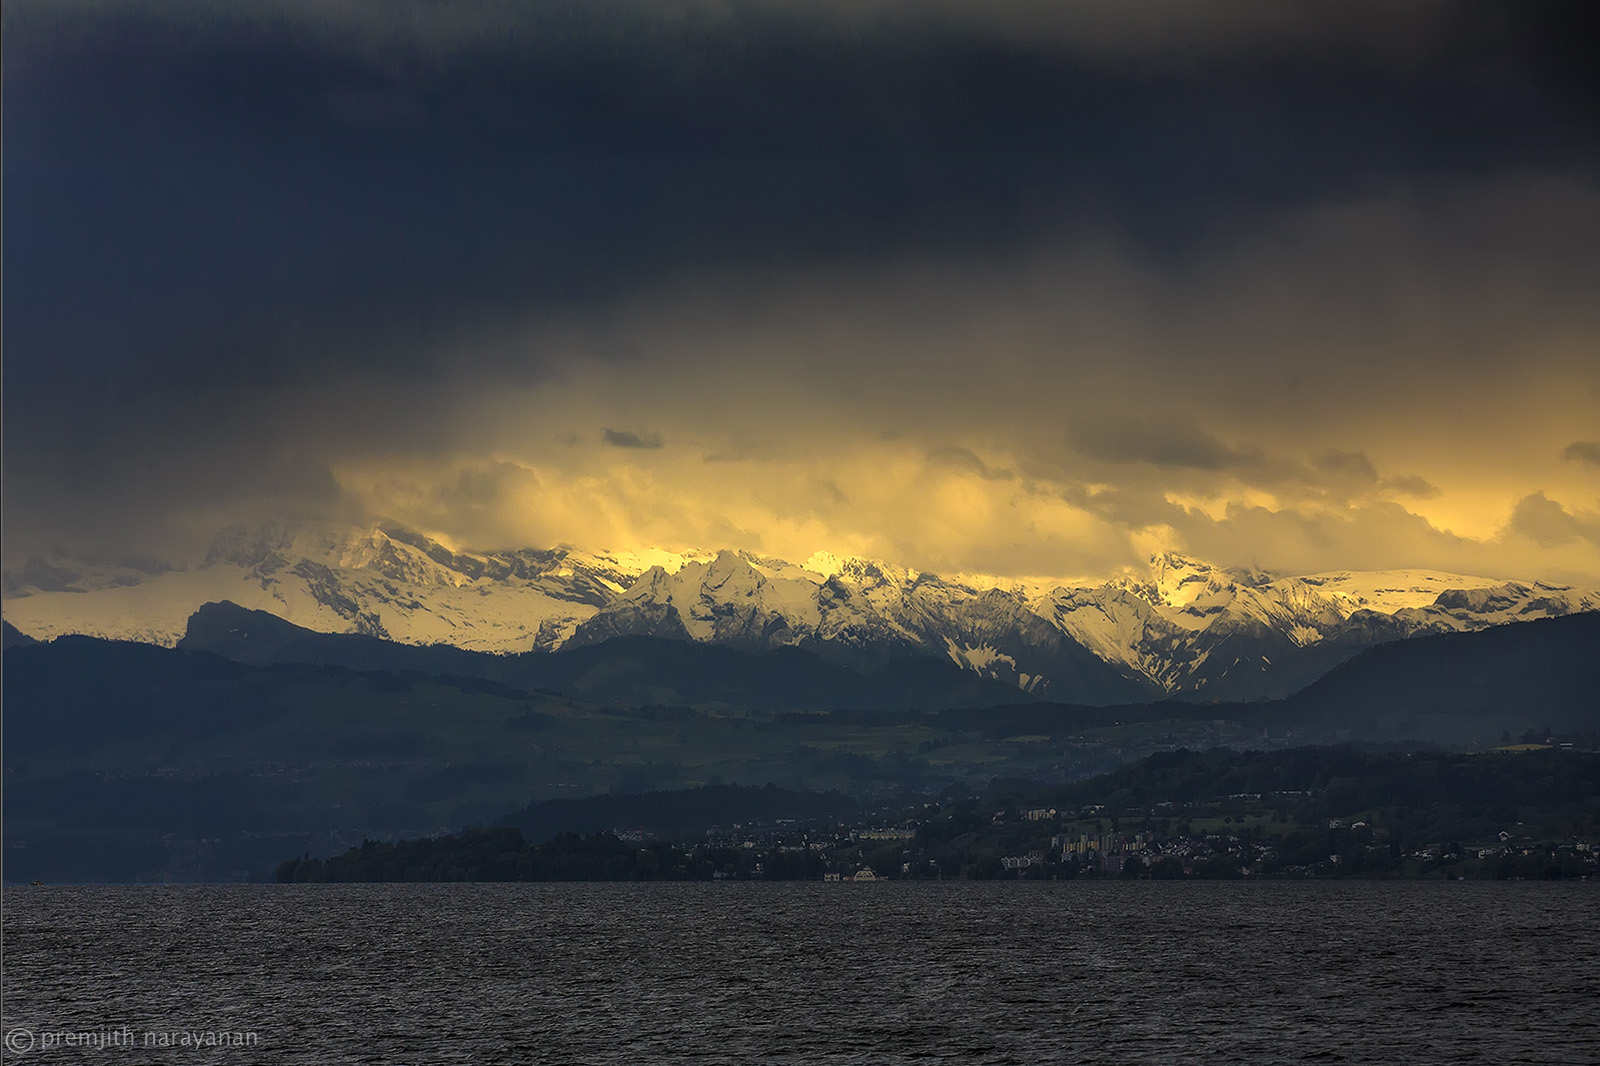 Alps view from Zurich